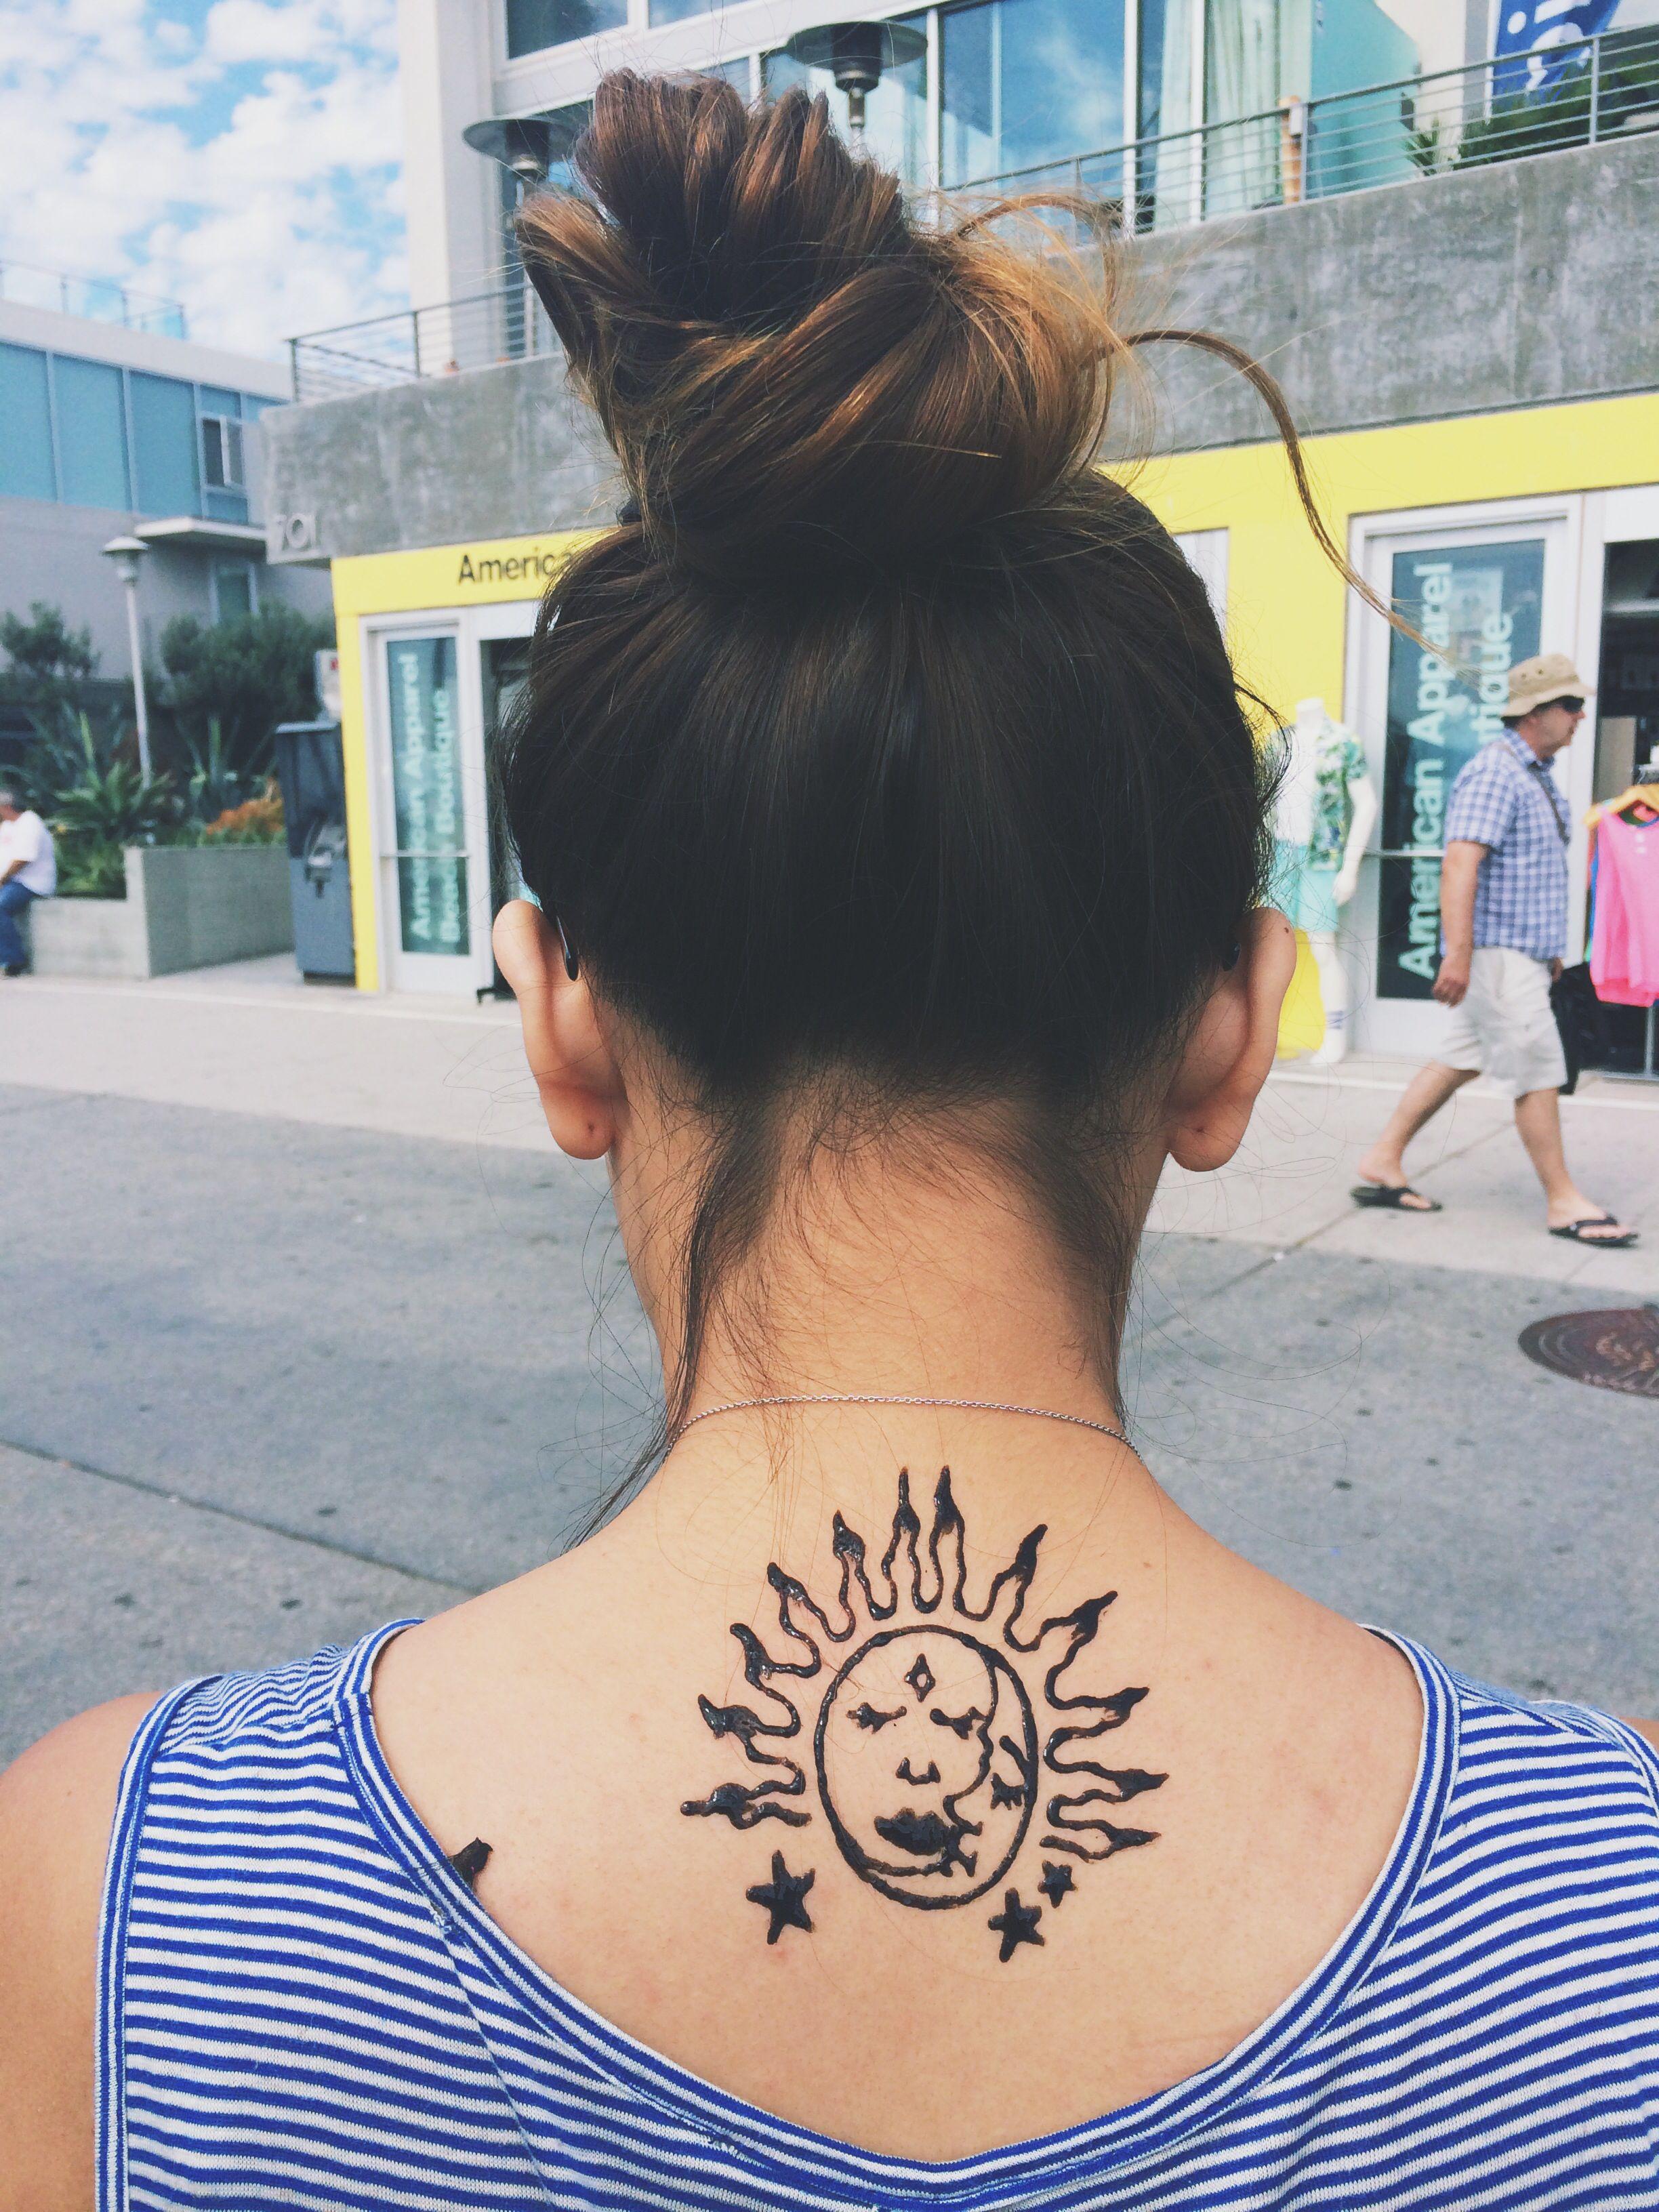 Henna tattoo from a local sidewalk artist in venice beach